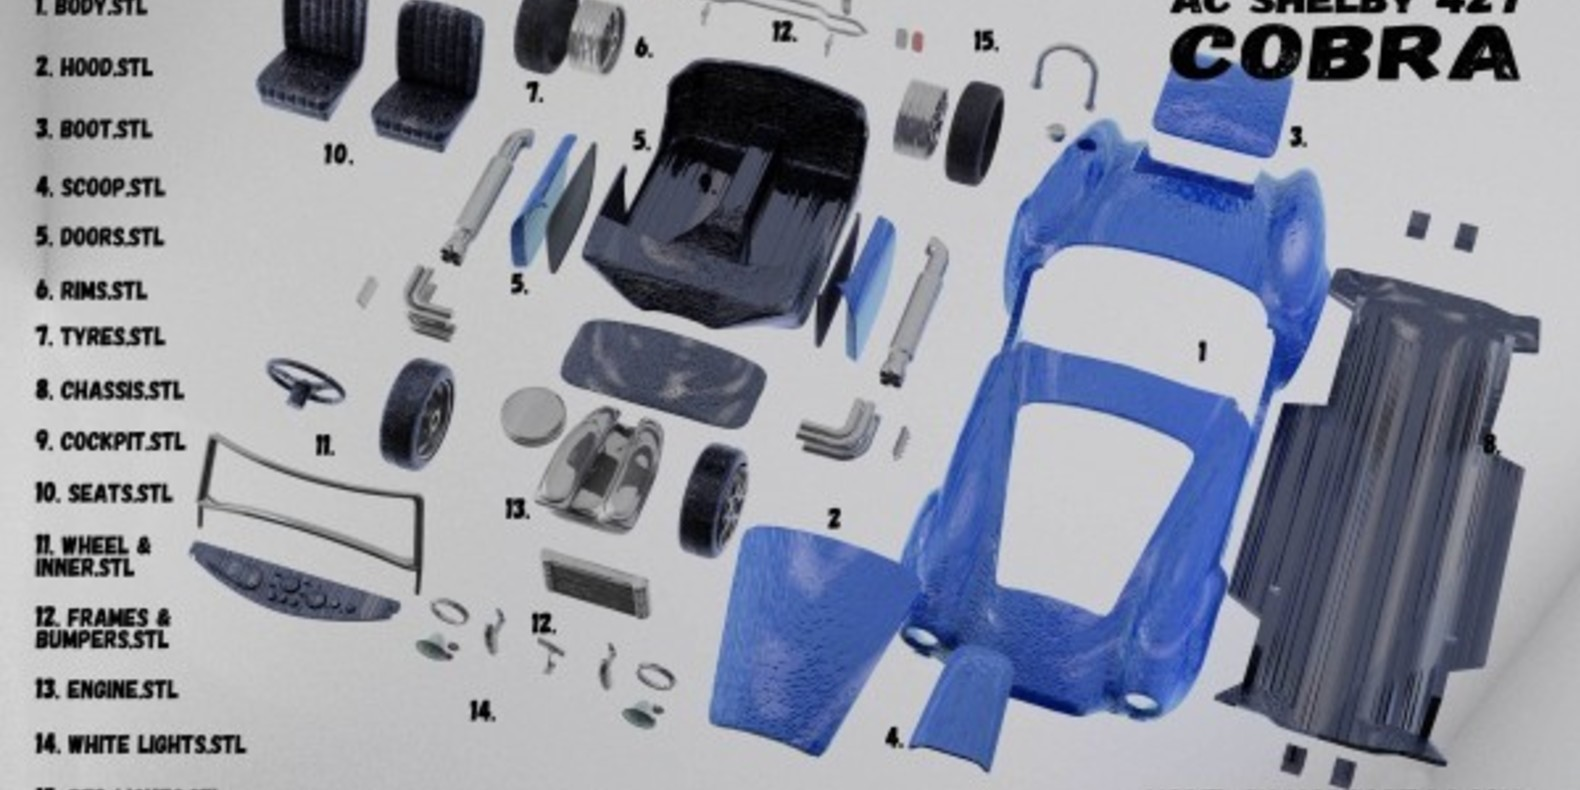 American Sports Car 4 - Mao Casella - Cults modélisme 3D printing Impression 3D Fichier 3D